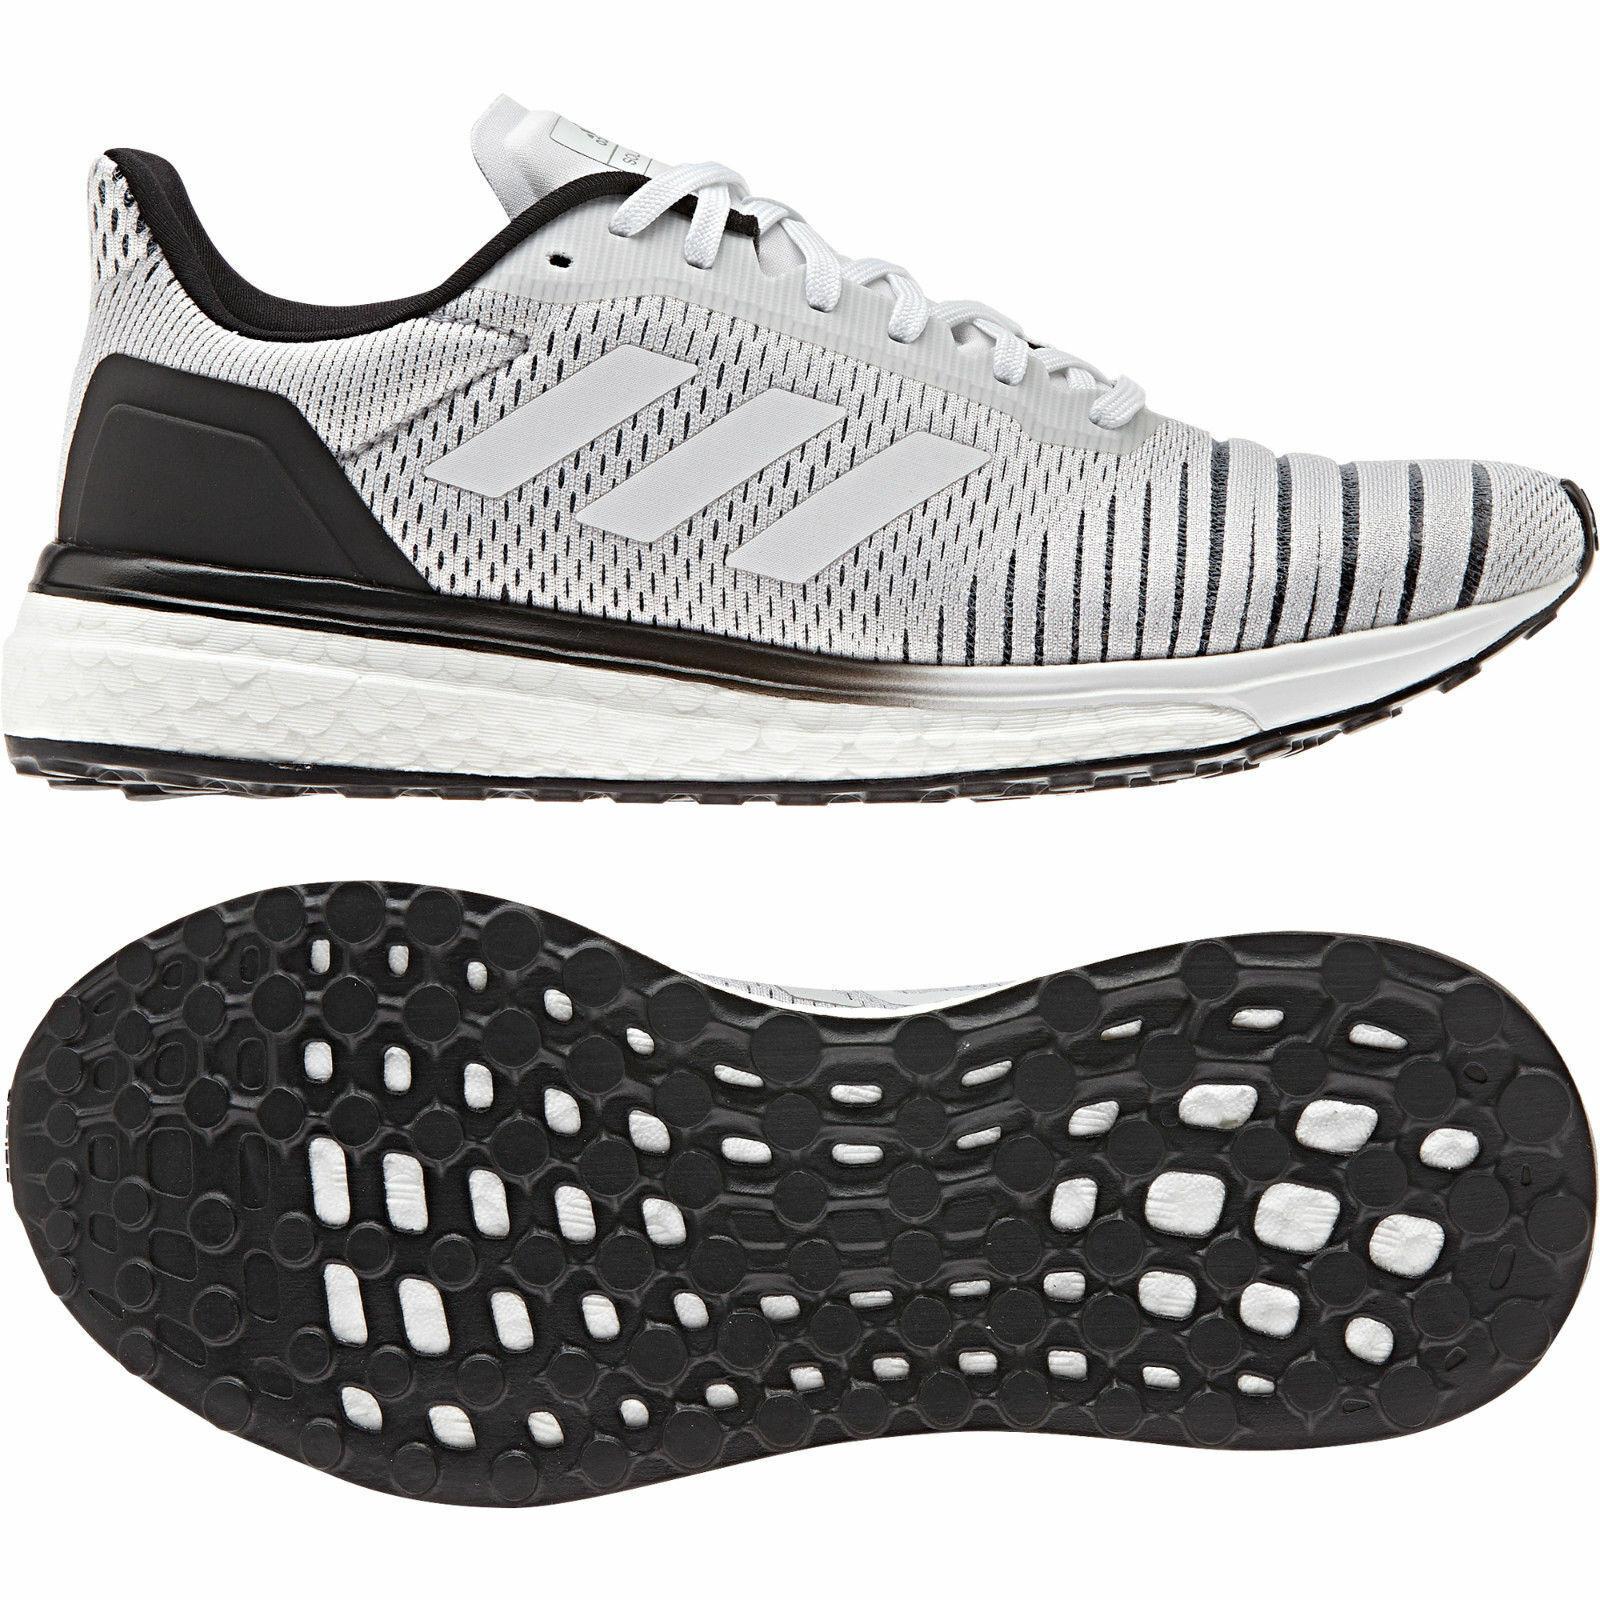 Adidas solar Drive w Boost running corre fitness zapato ac8141 nuevo embalaje original